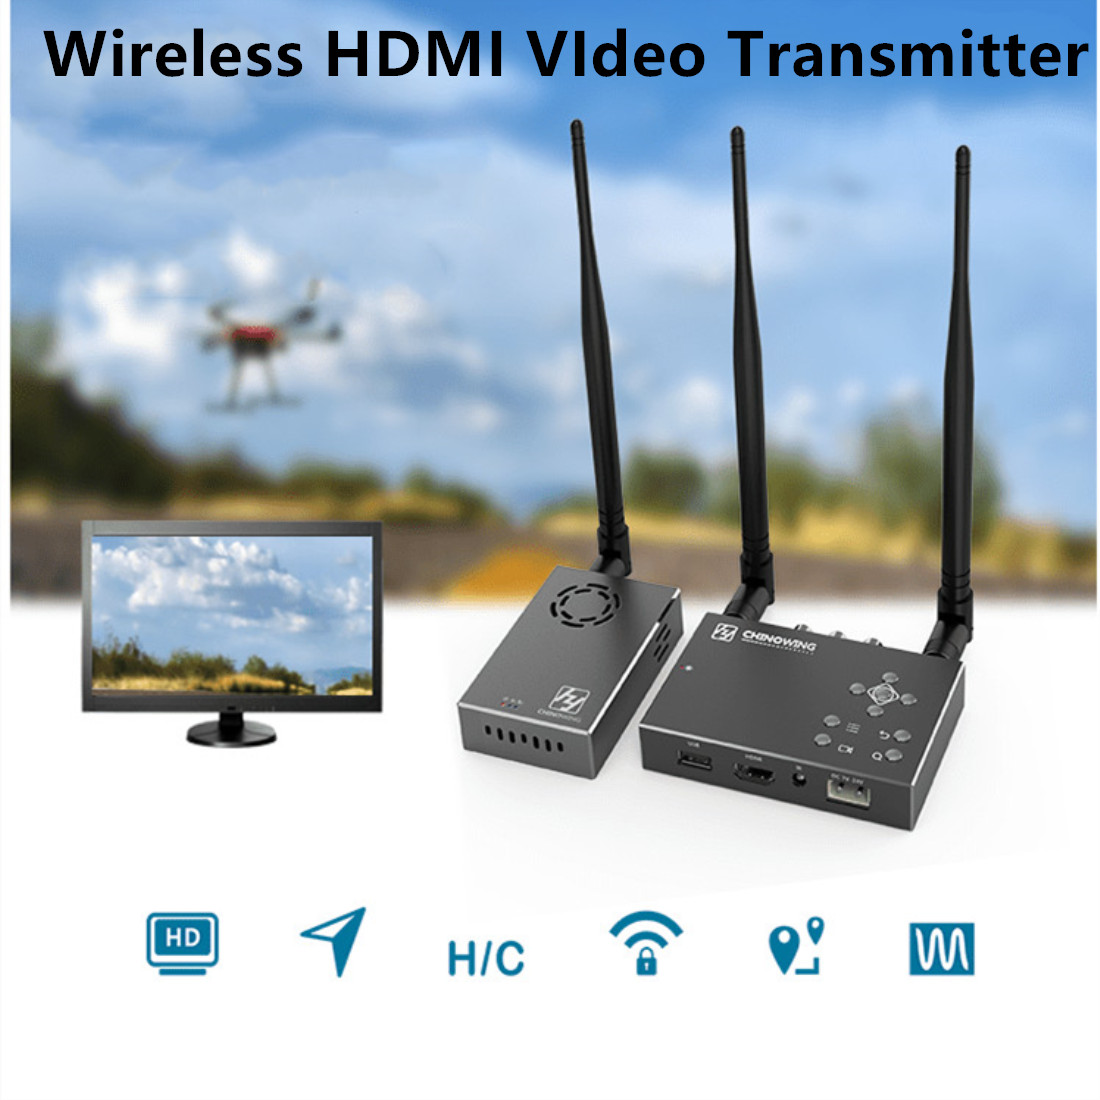 Over 30KM Wireless HDMI image Transmission 100-900Mhz Full HD 1080P COFDM Digital FPV Wireless Video Transmitter 12